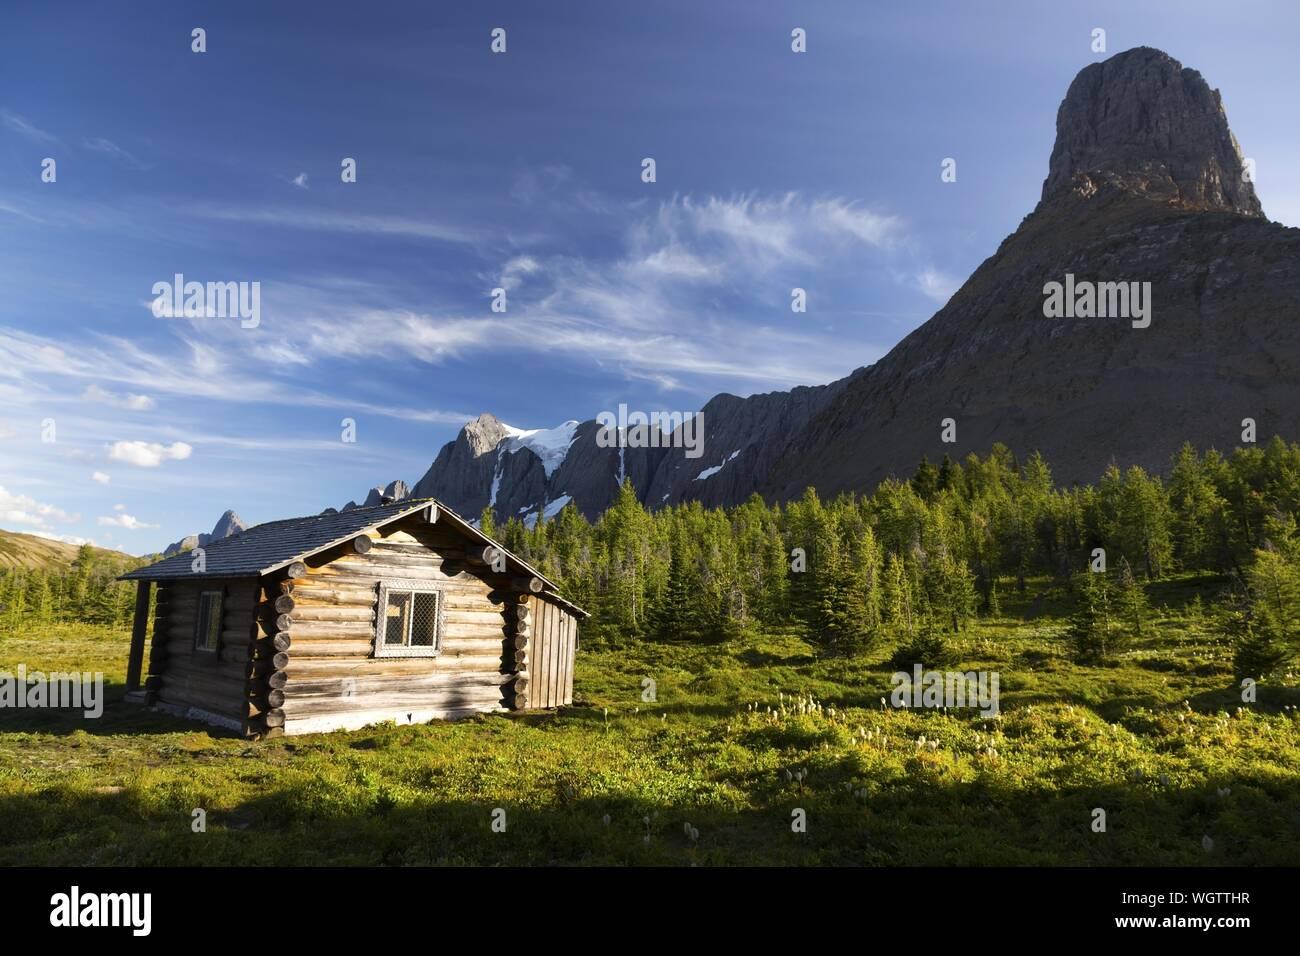 Heritage Landmark Outfitter Log Cabin on Green Alpine Meadow near Wolverine Pass below Rockwall Mountain Peak, Kootenay National Park Canadian Rockies Stock Photo